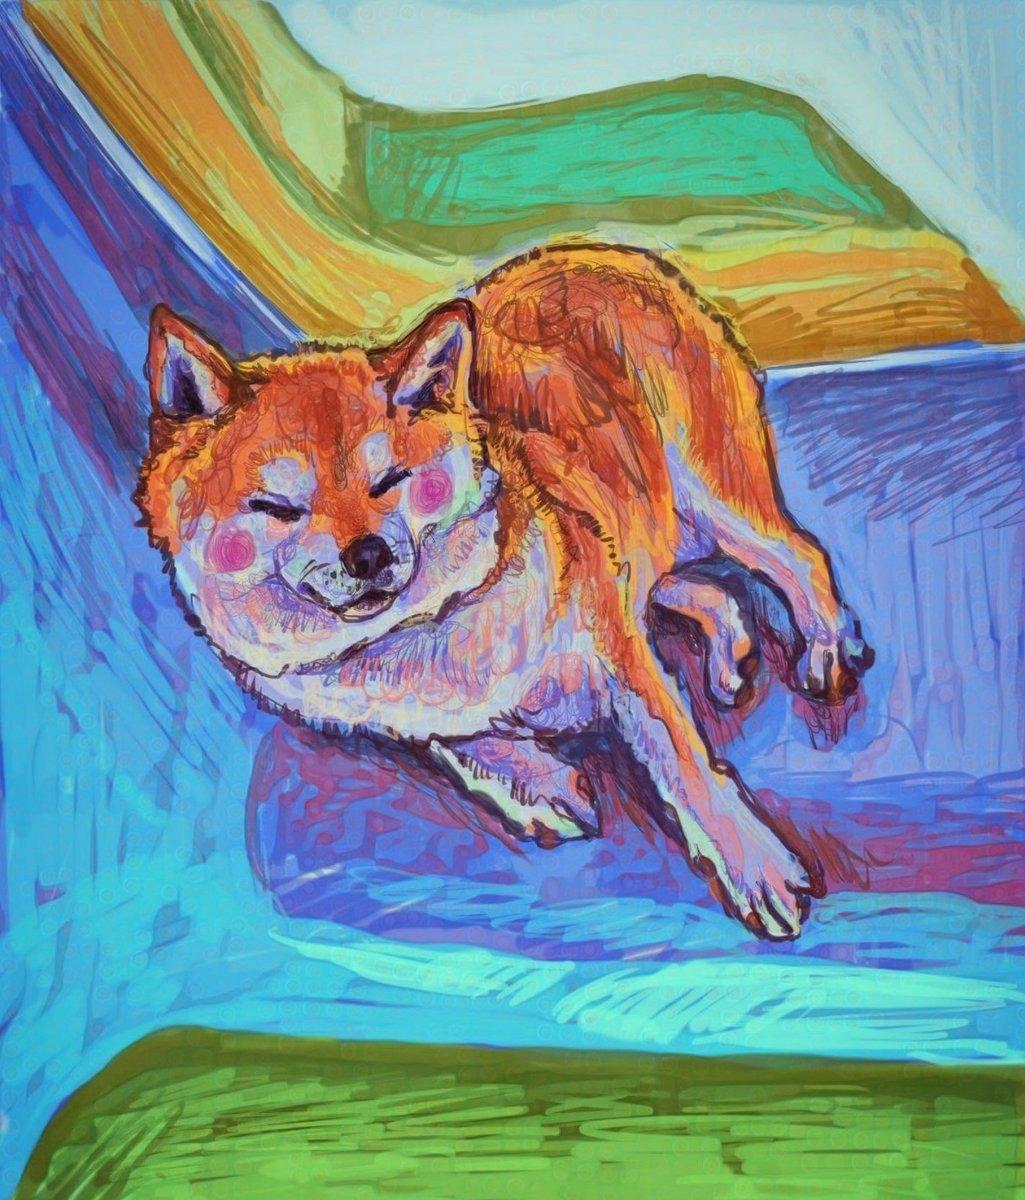 『A Calming Shade Of Blue』 #drawing #ドローイング #犬好きと繋がりたい #柴犬 pic.twitter.com/wurAAzrUyU